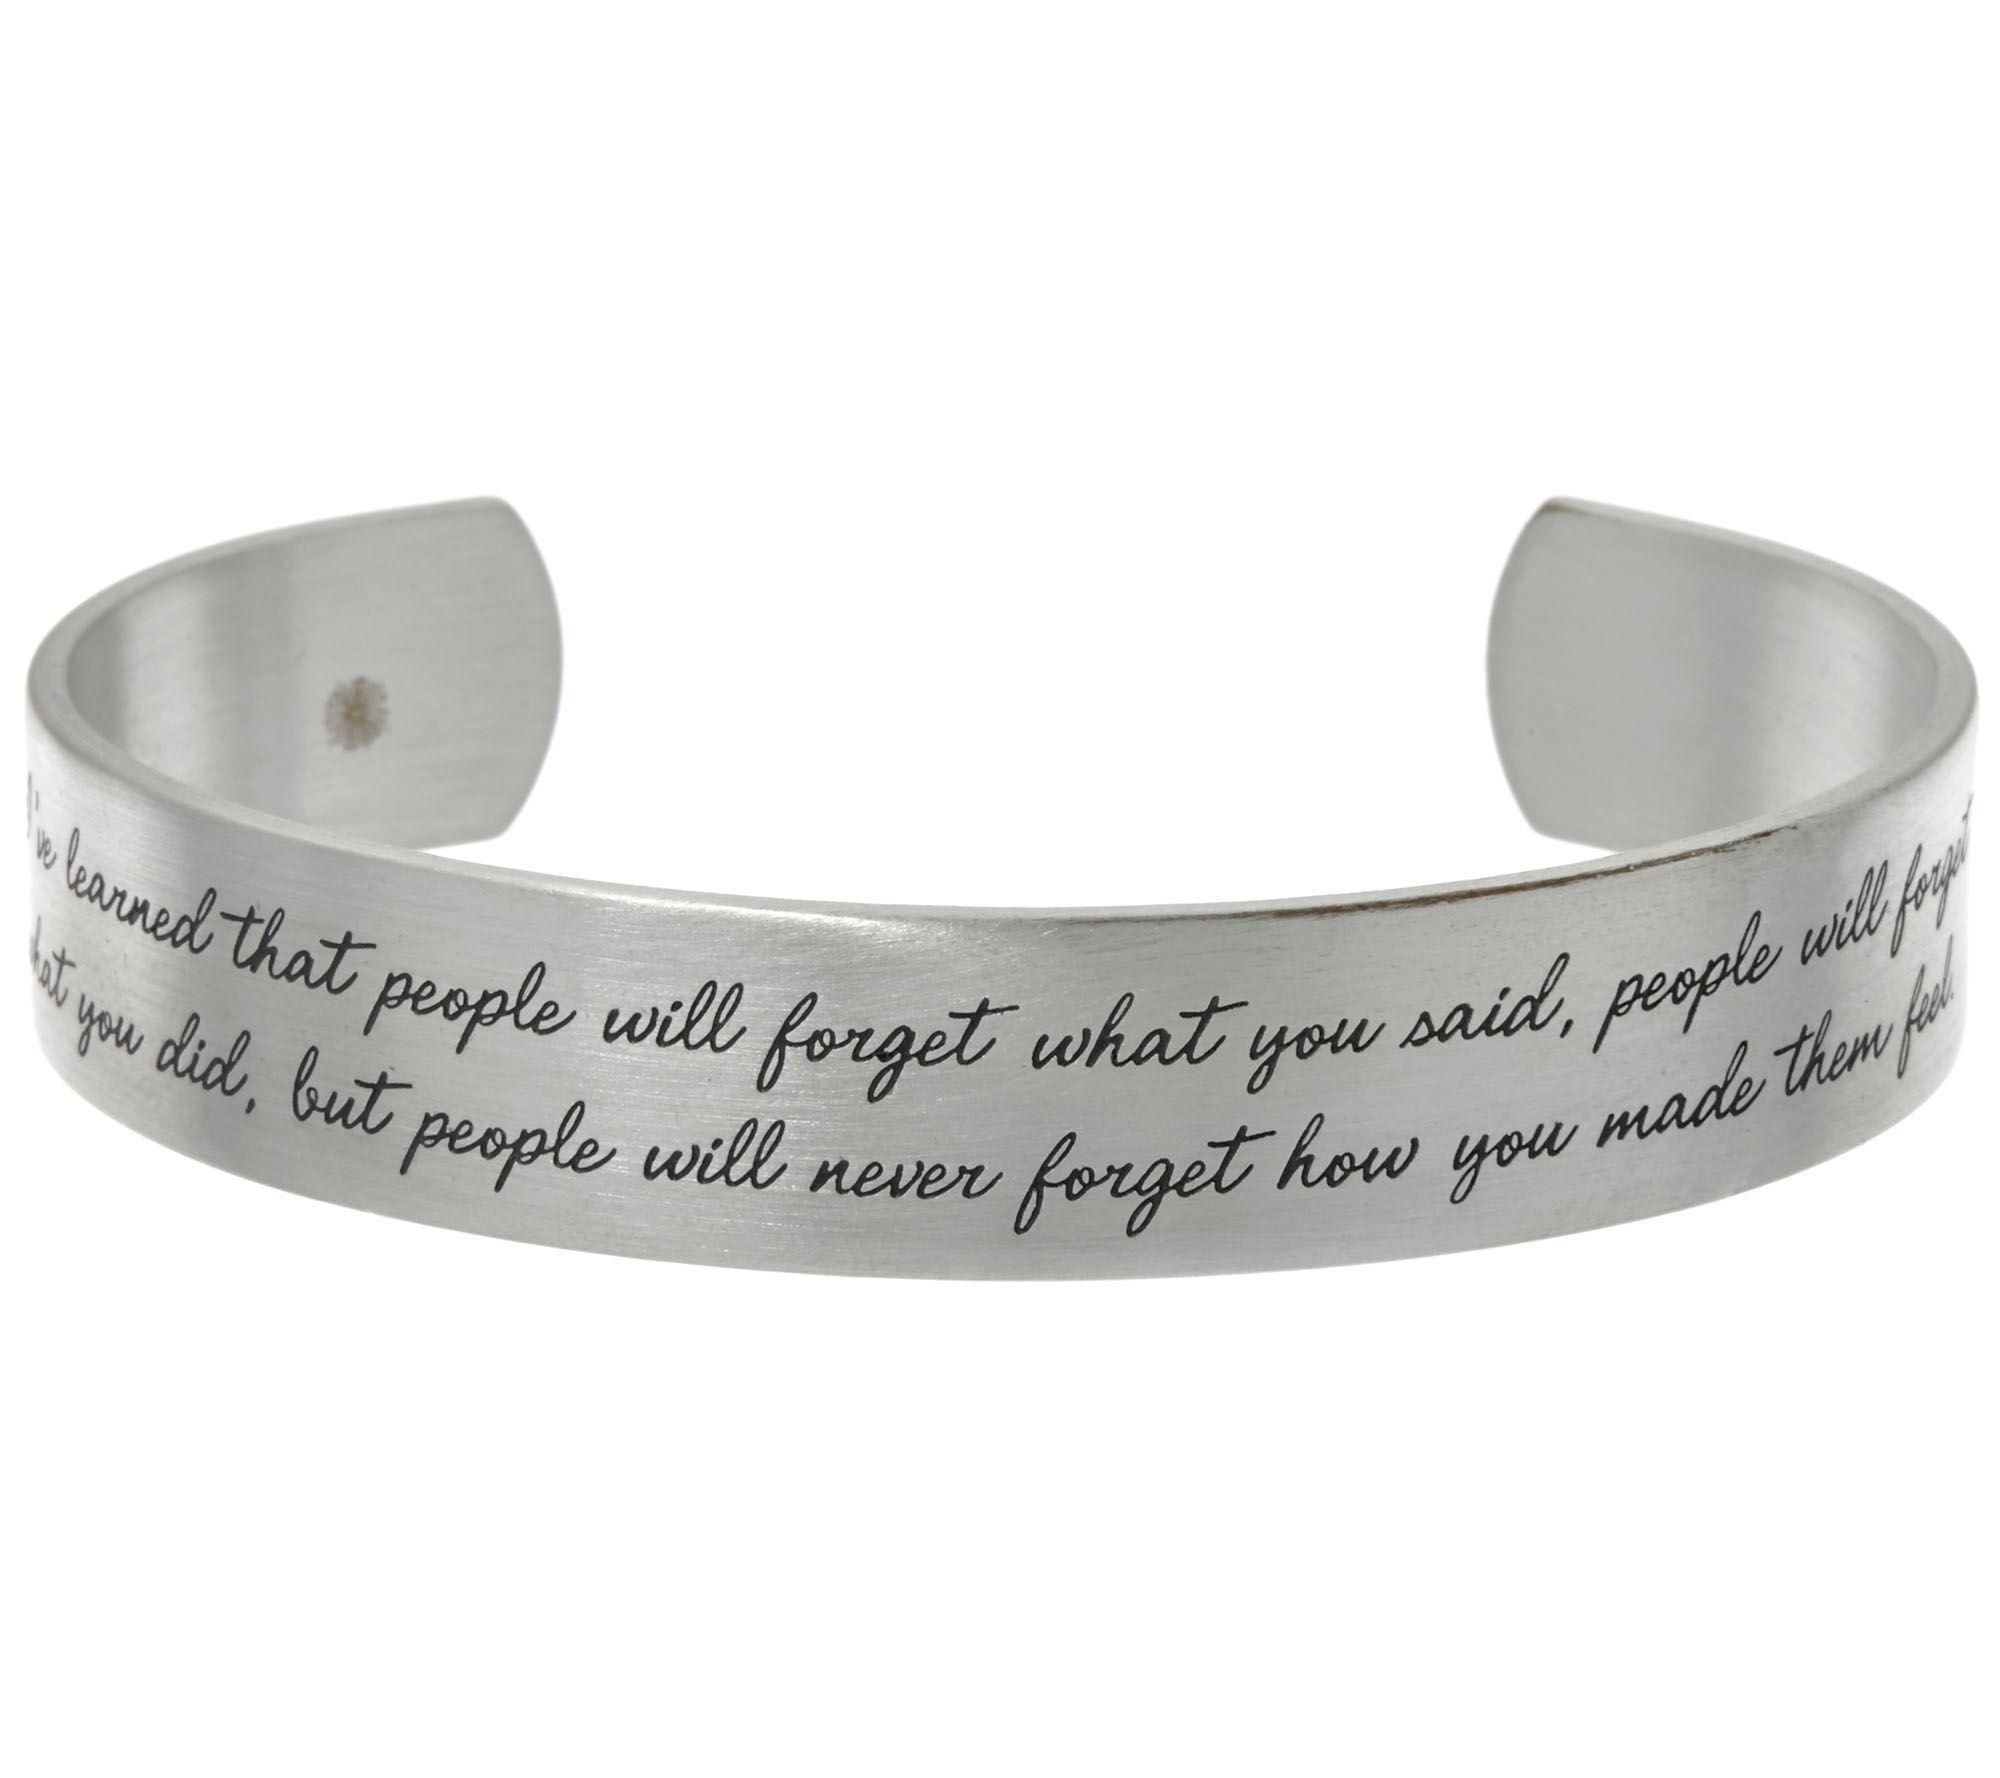 Uk Seller! new And Sealed Learned Ankle Bracelet